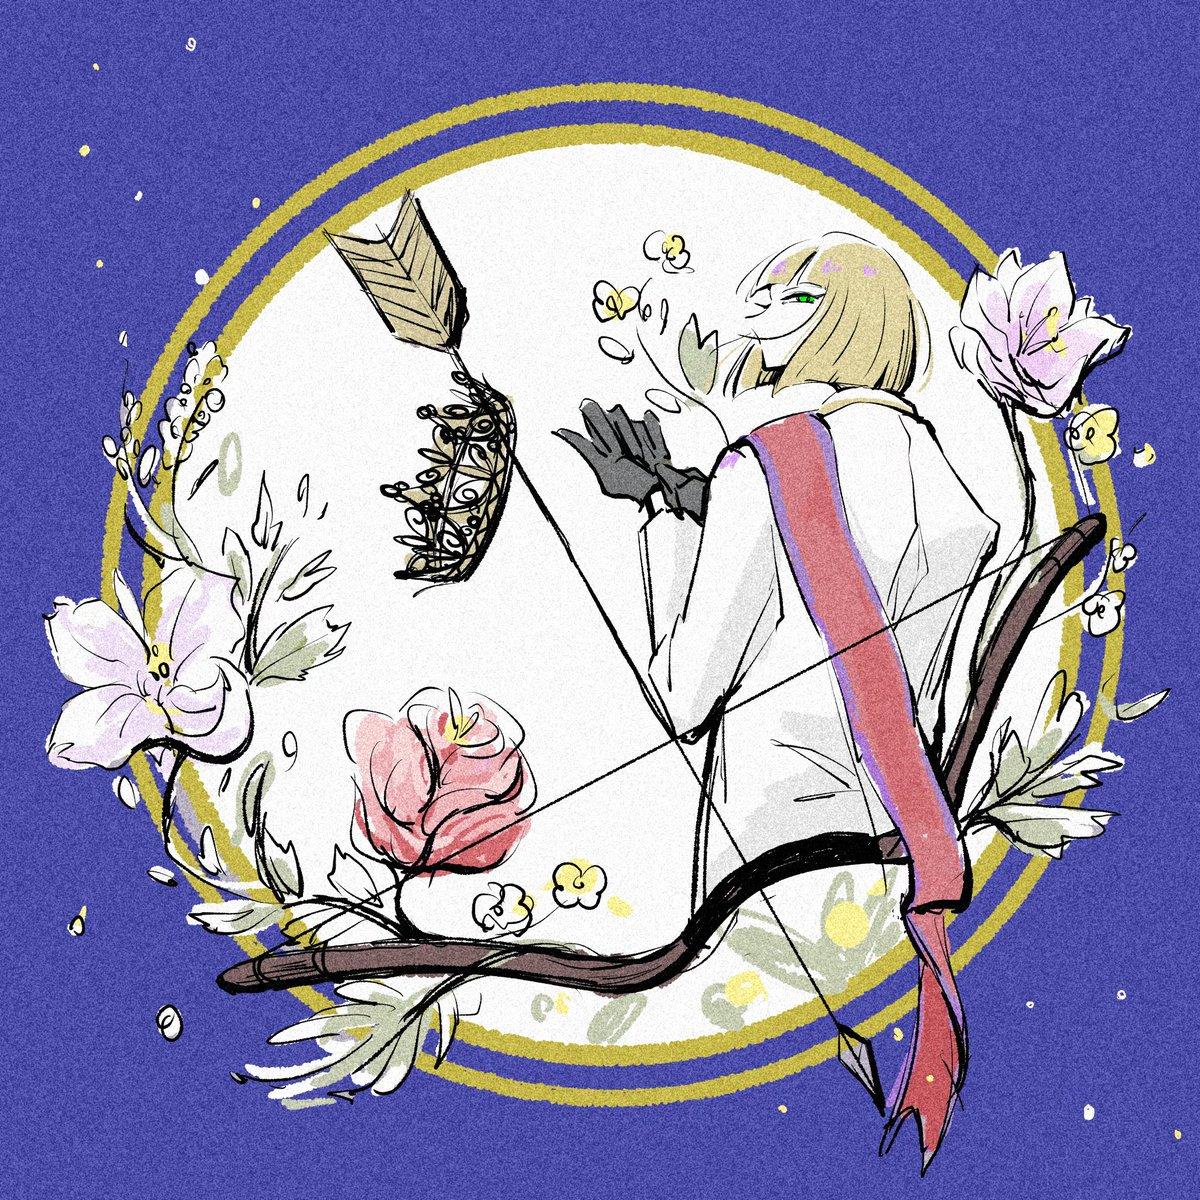 RT @nonoko_szr: #ルーク・ハント誕生祭2020 おめでとうルークさん愛してるよ🏹 https://t.co/LfOcXxfzSh